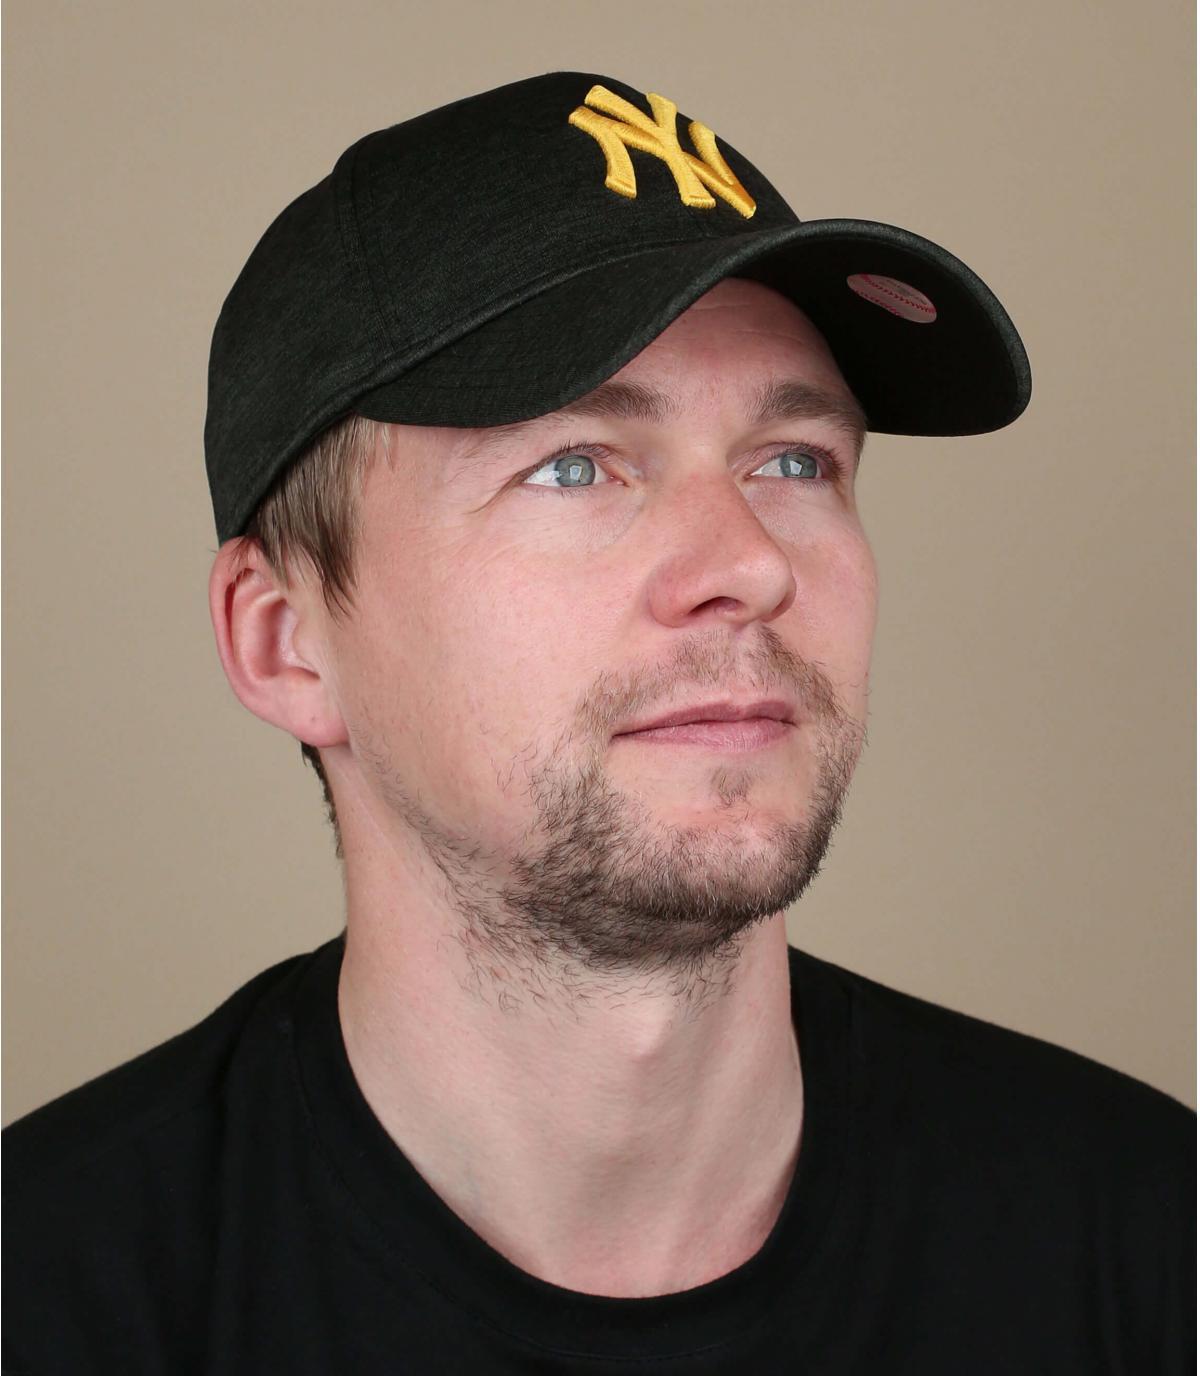 cappellino NY nero giallo